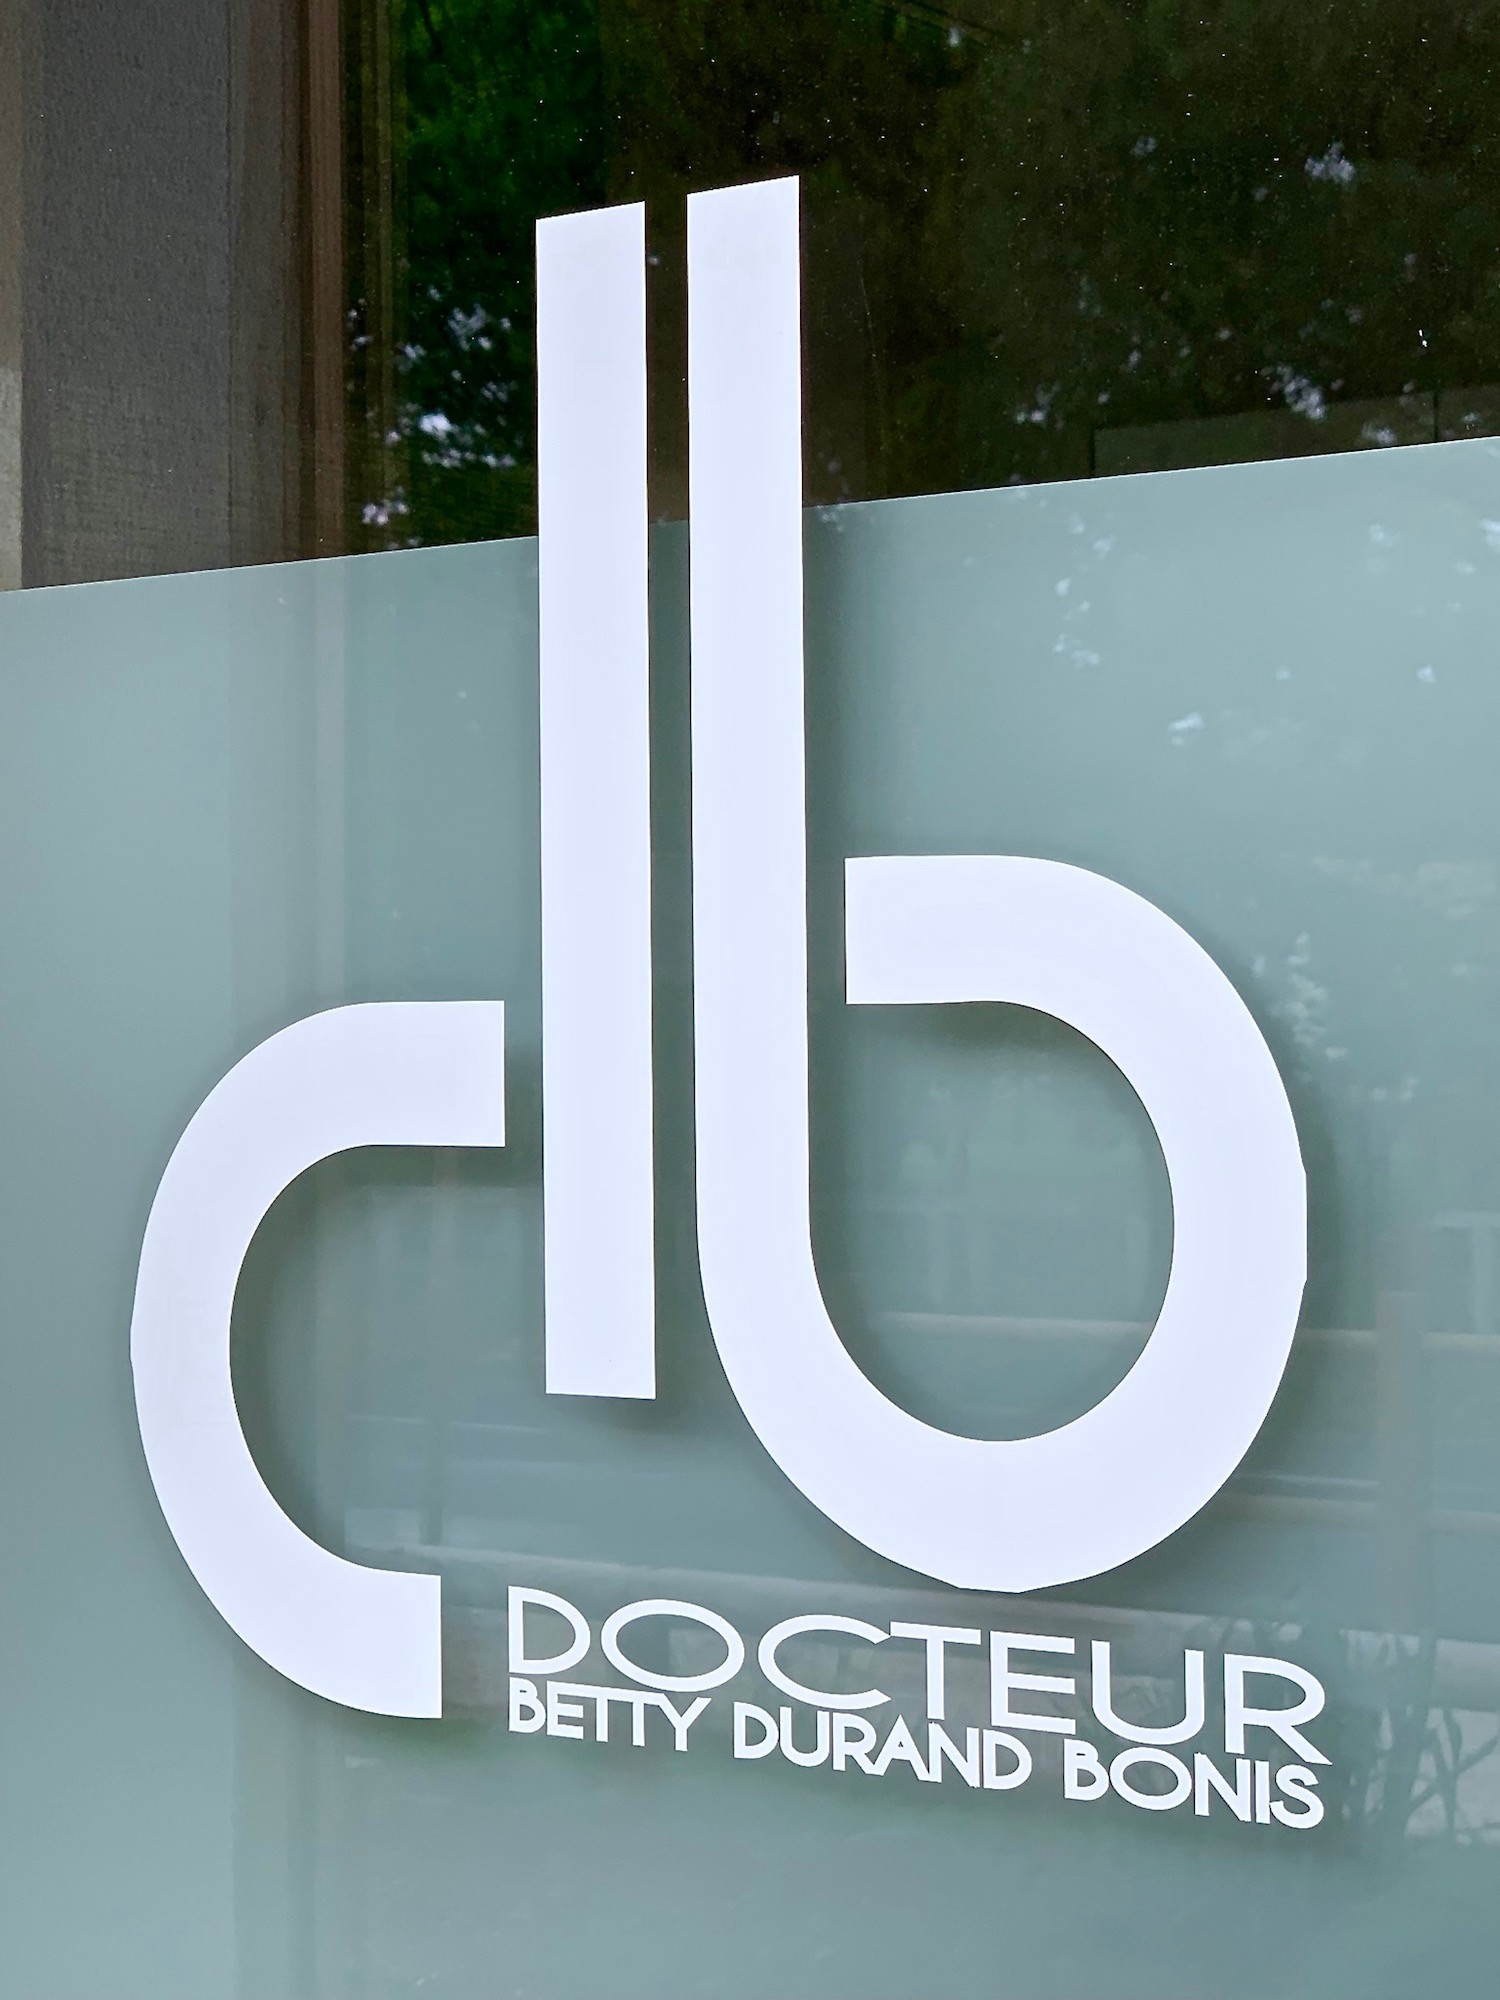 Dr Durand Bonis